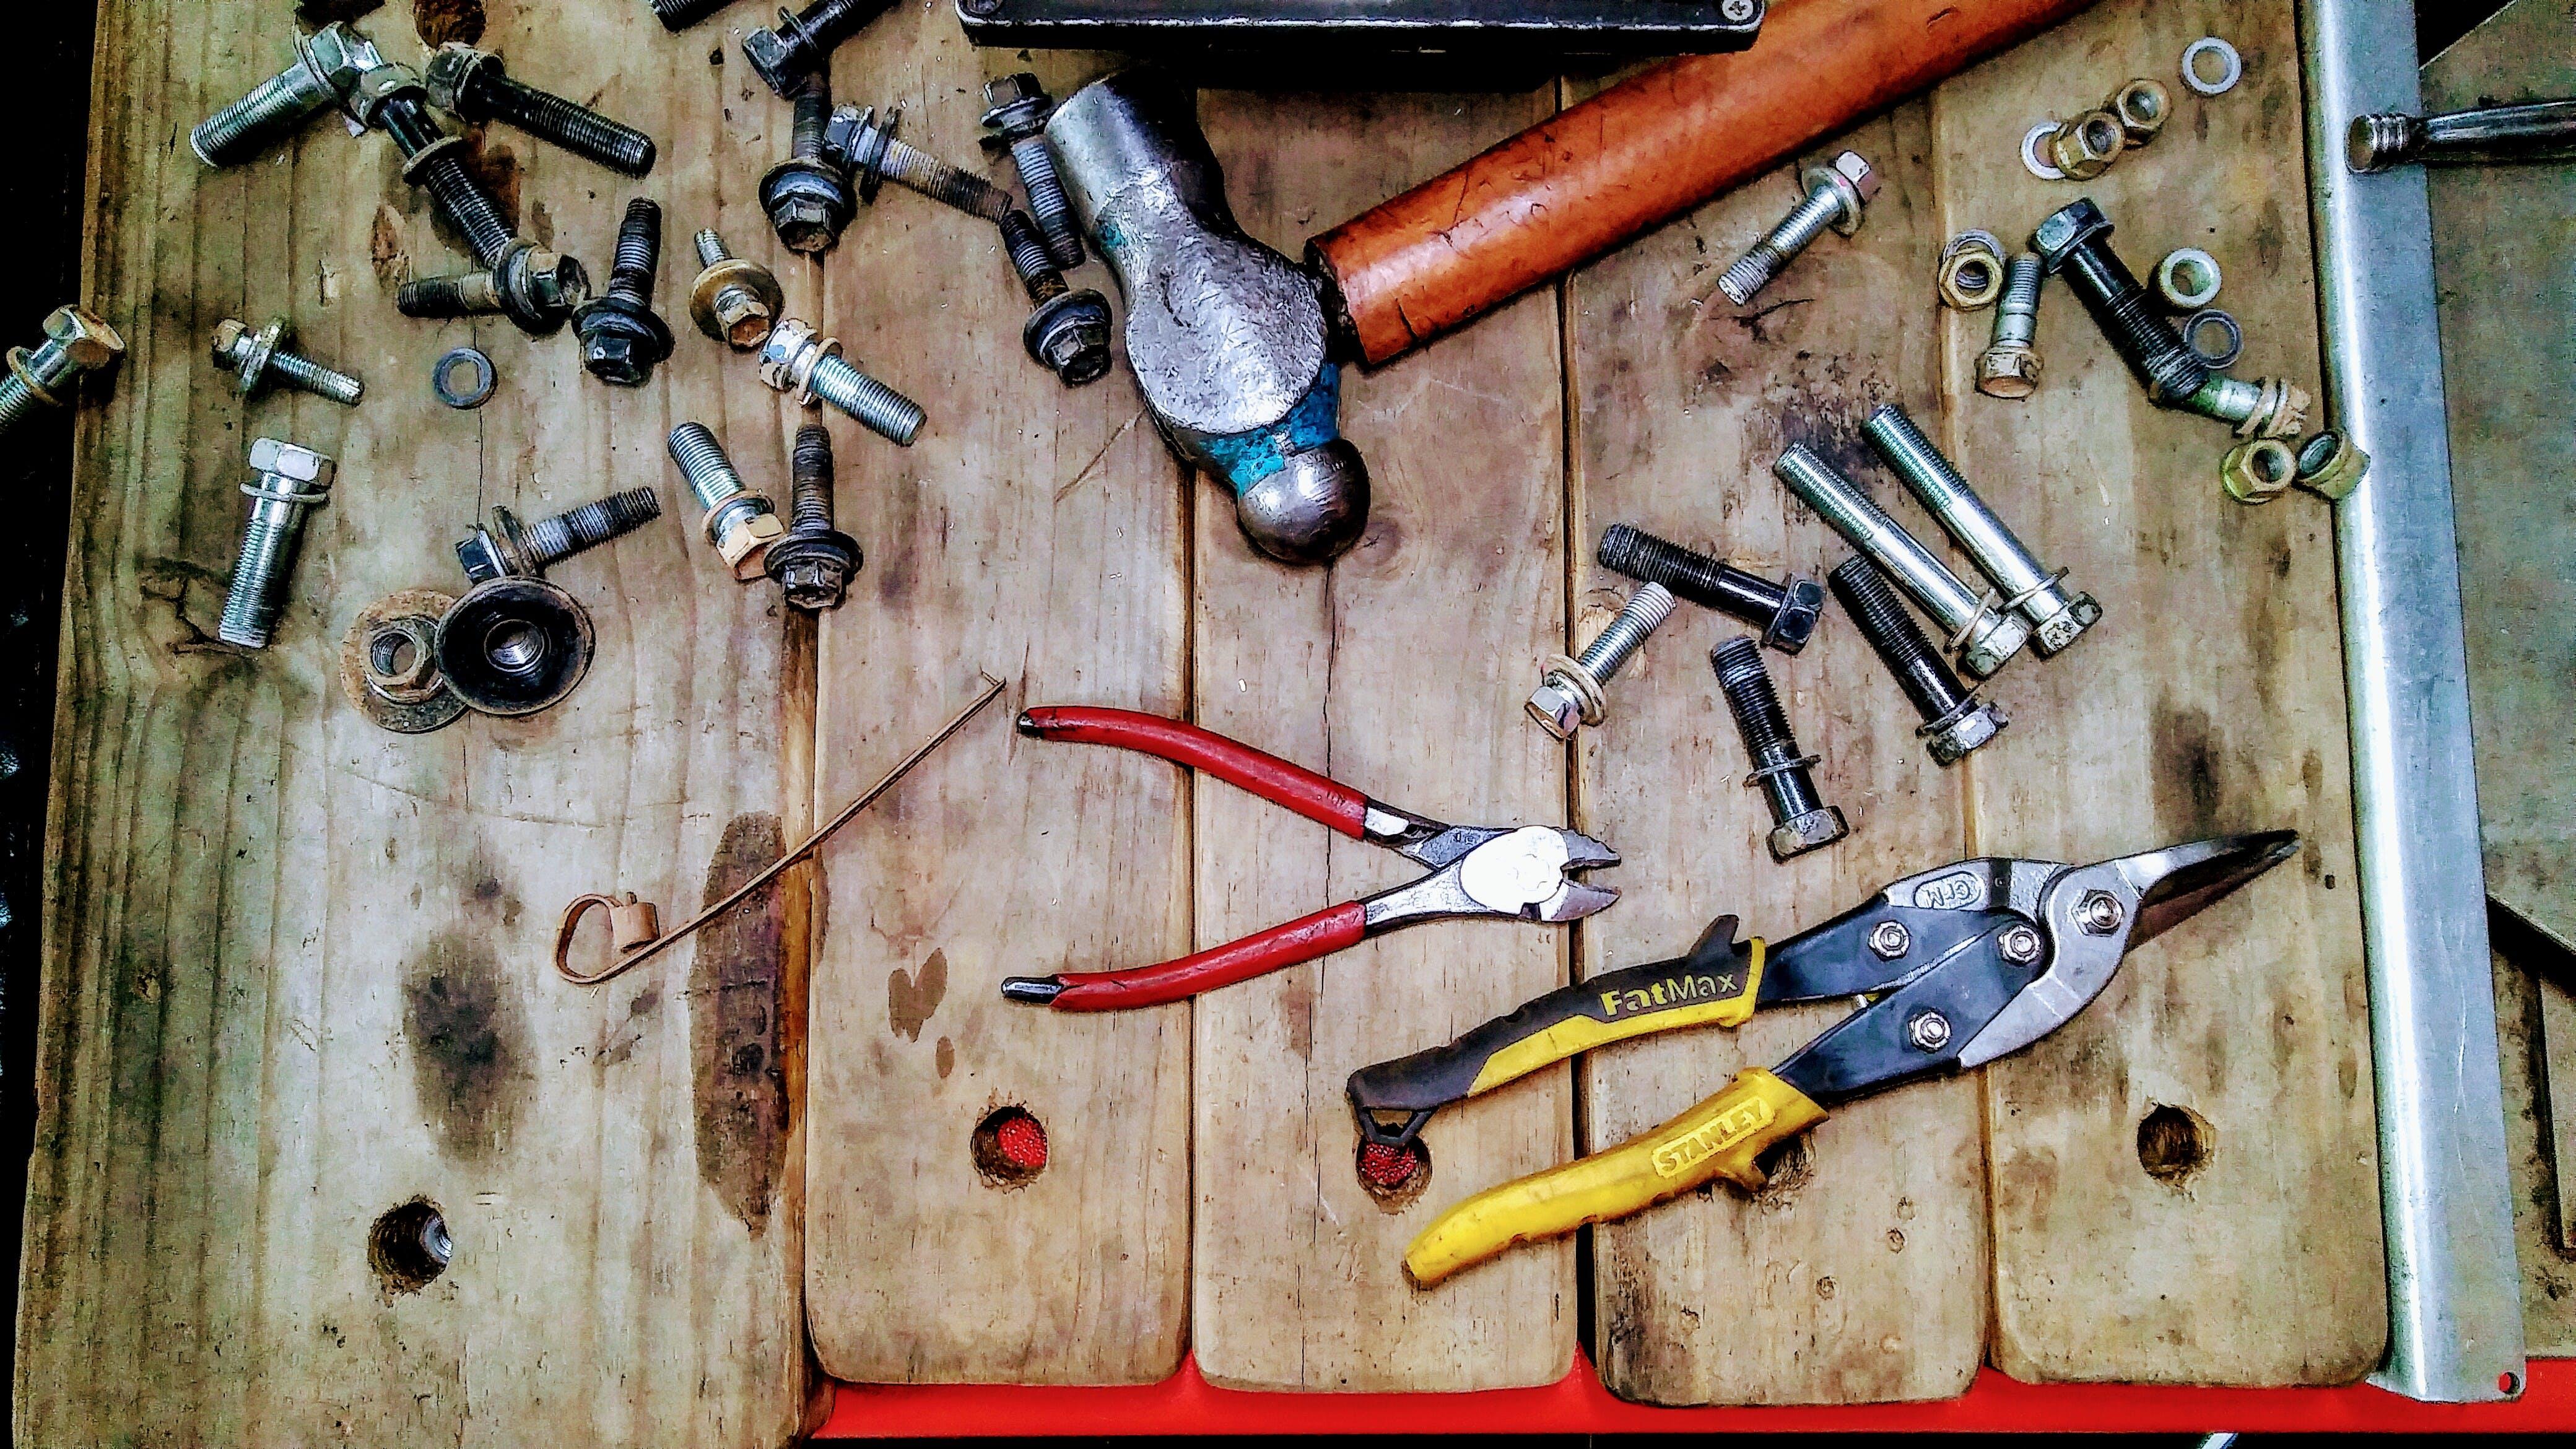 cutting tools, hammer, mechanic